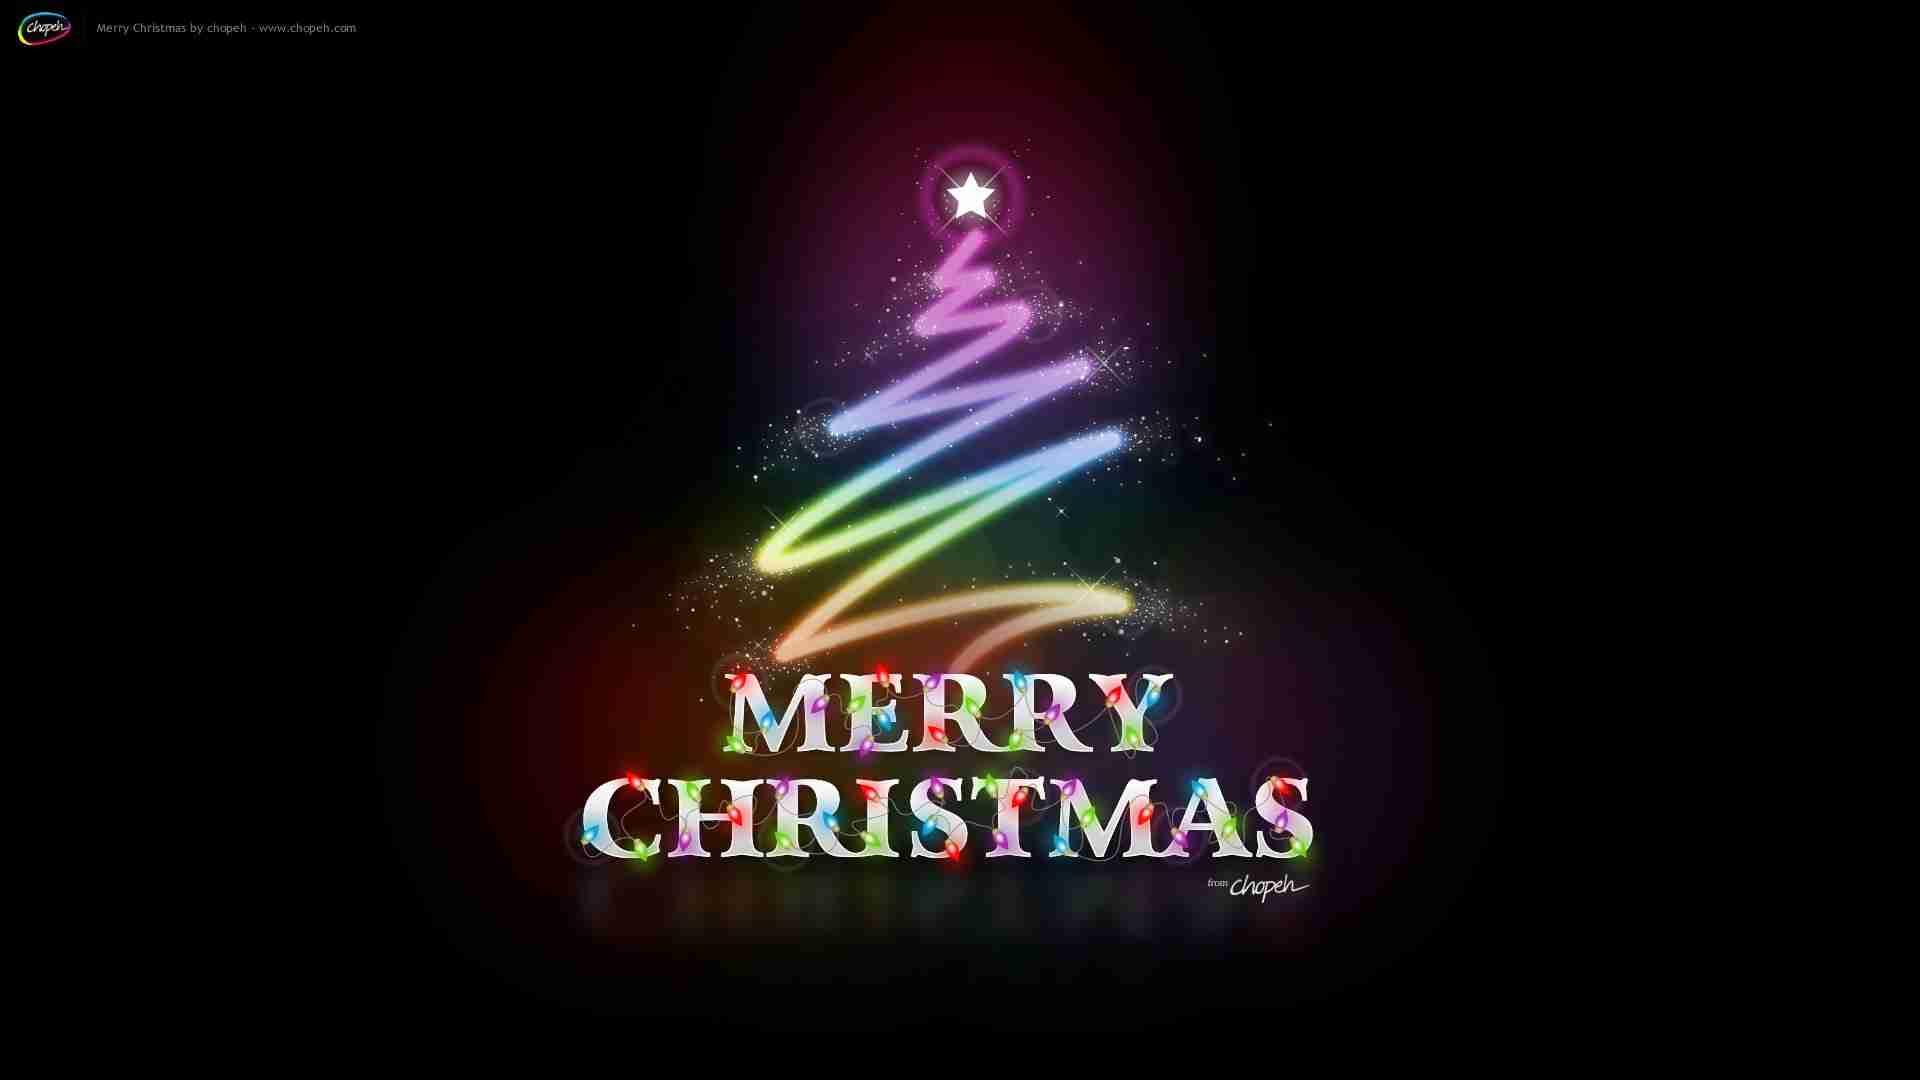 Merry Christmas By Chopeh